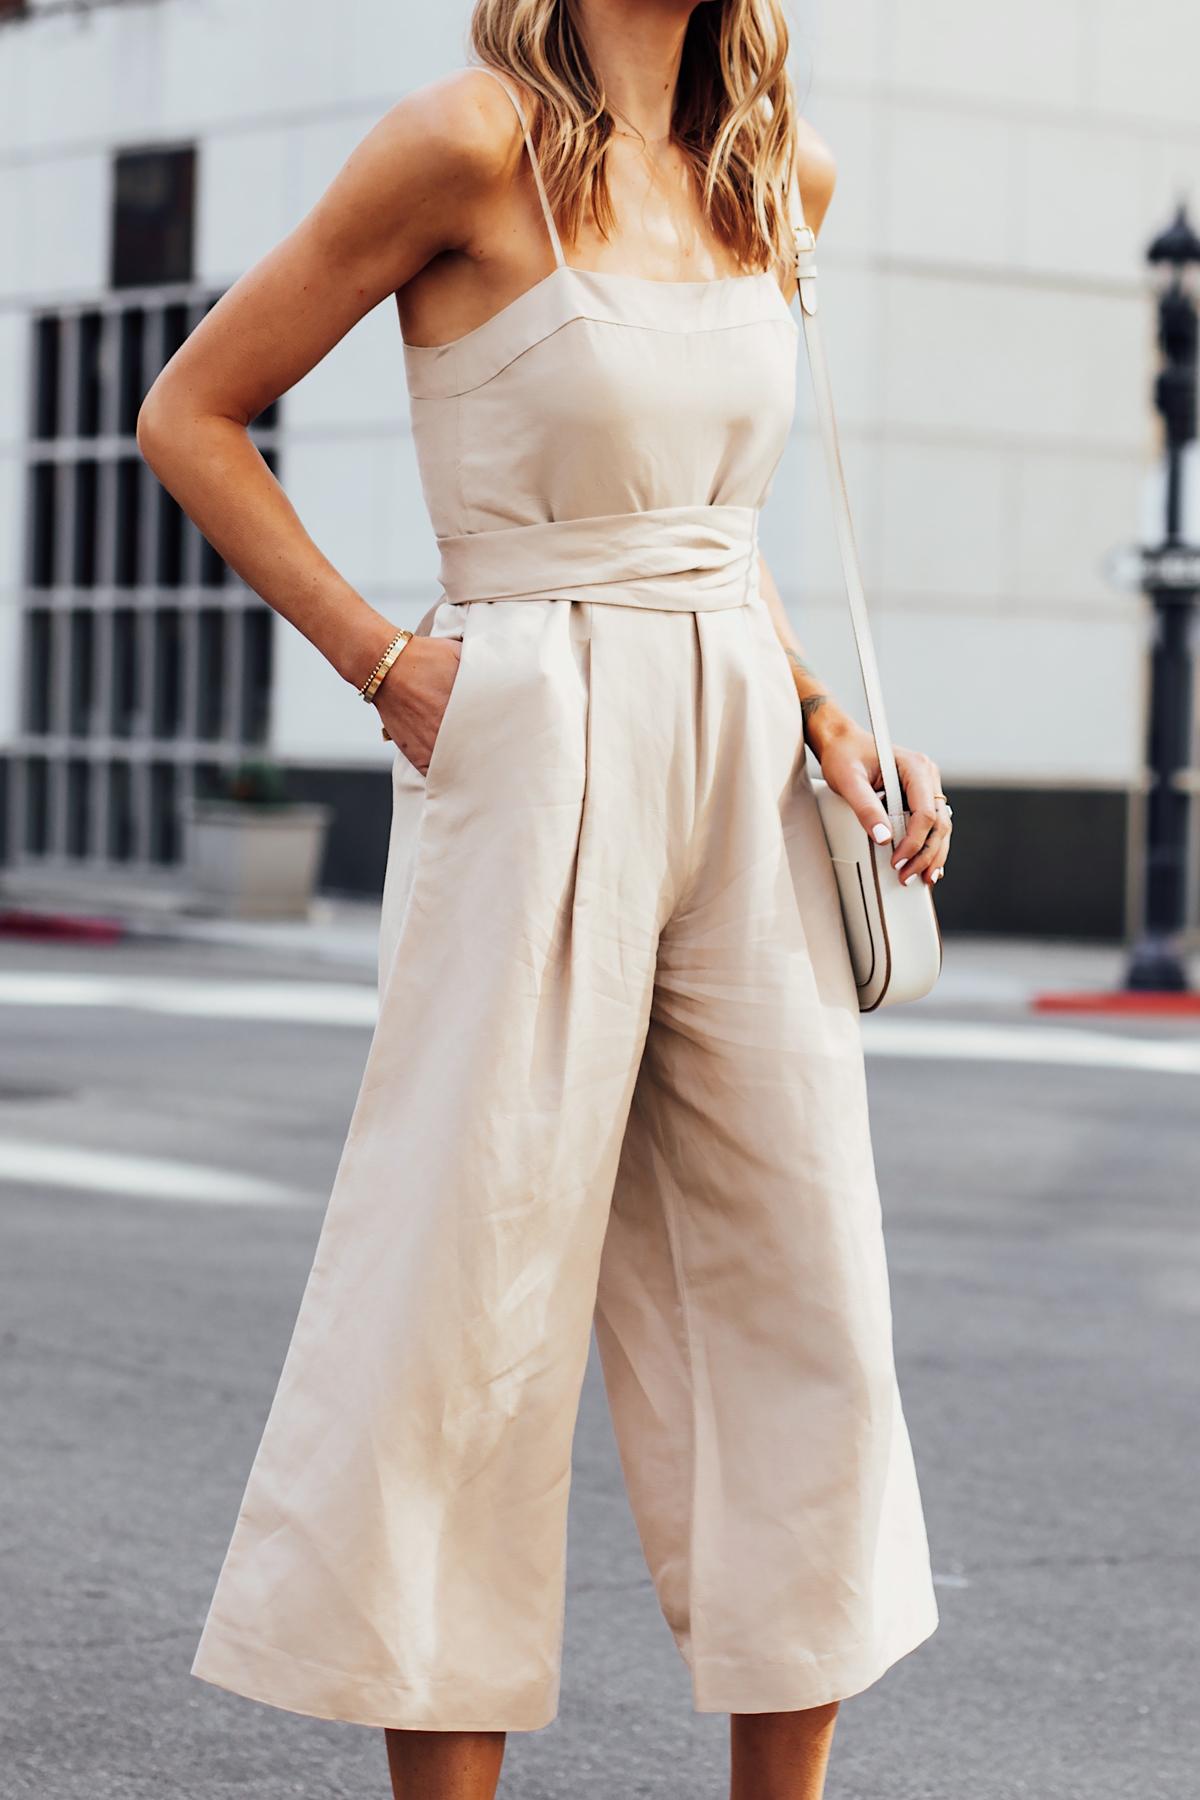 Blonde Woman Wearing Banana Republic Beige Linen Jumpsuit Fashion Jackson San Diego Fashion Blogger Street Style